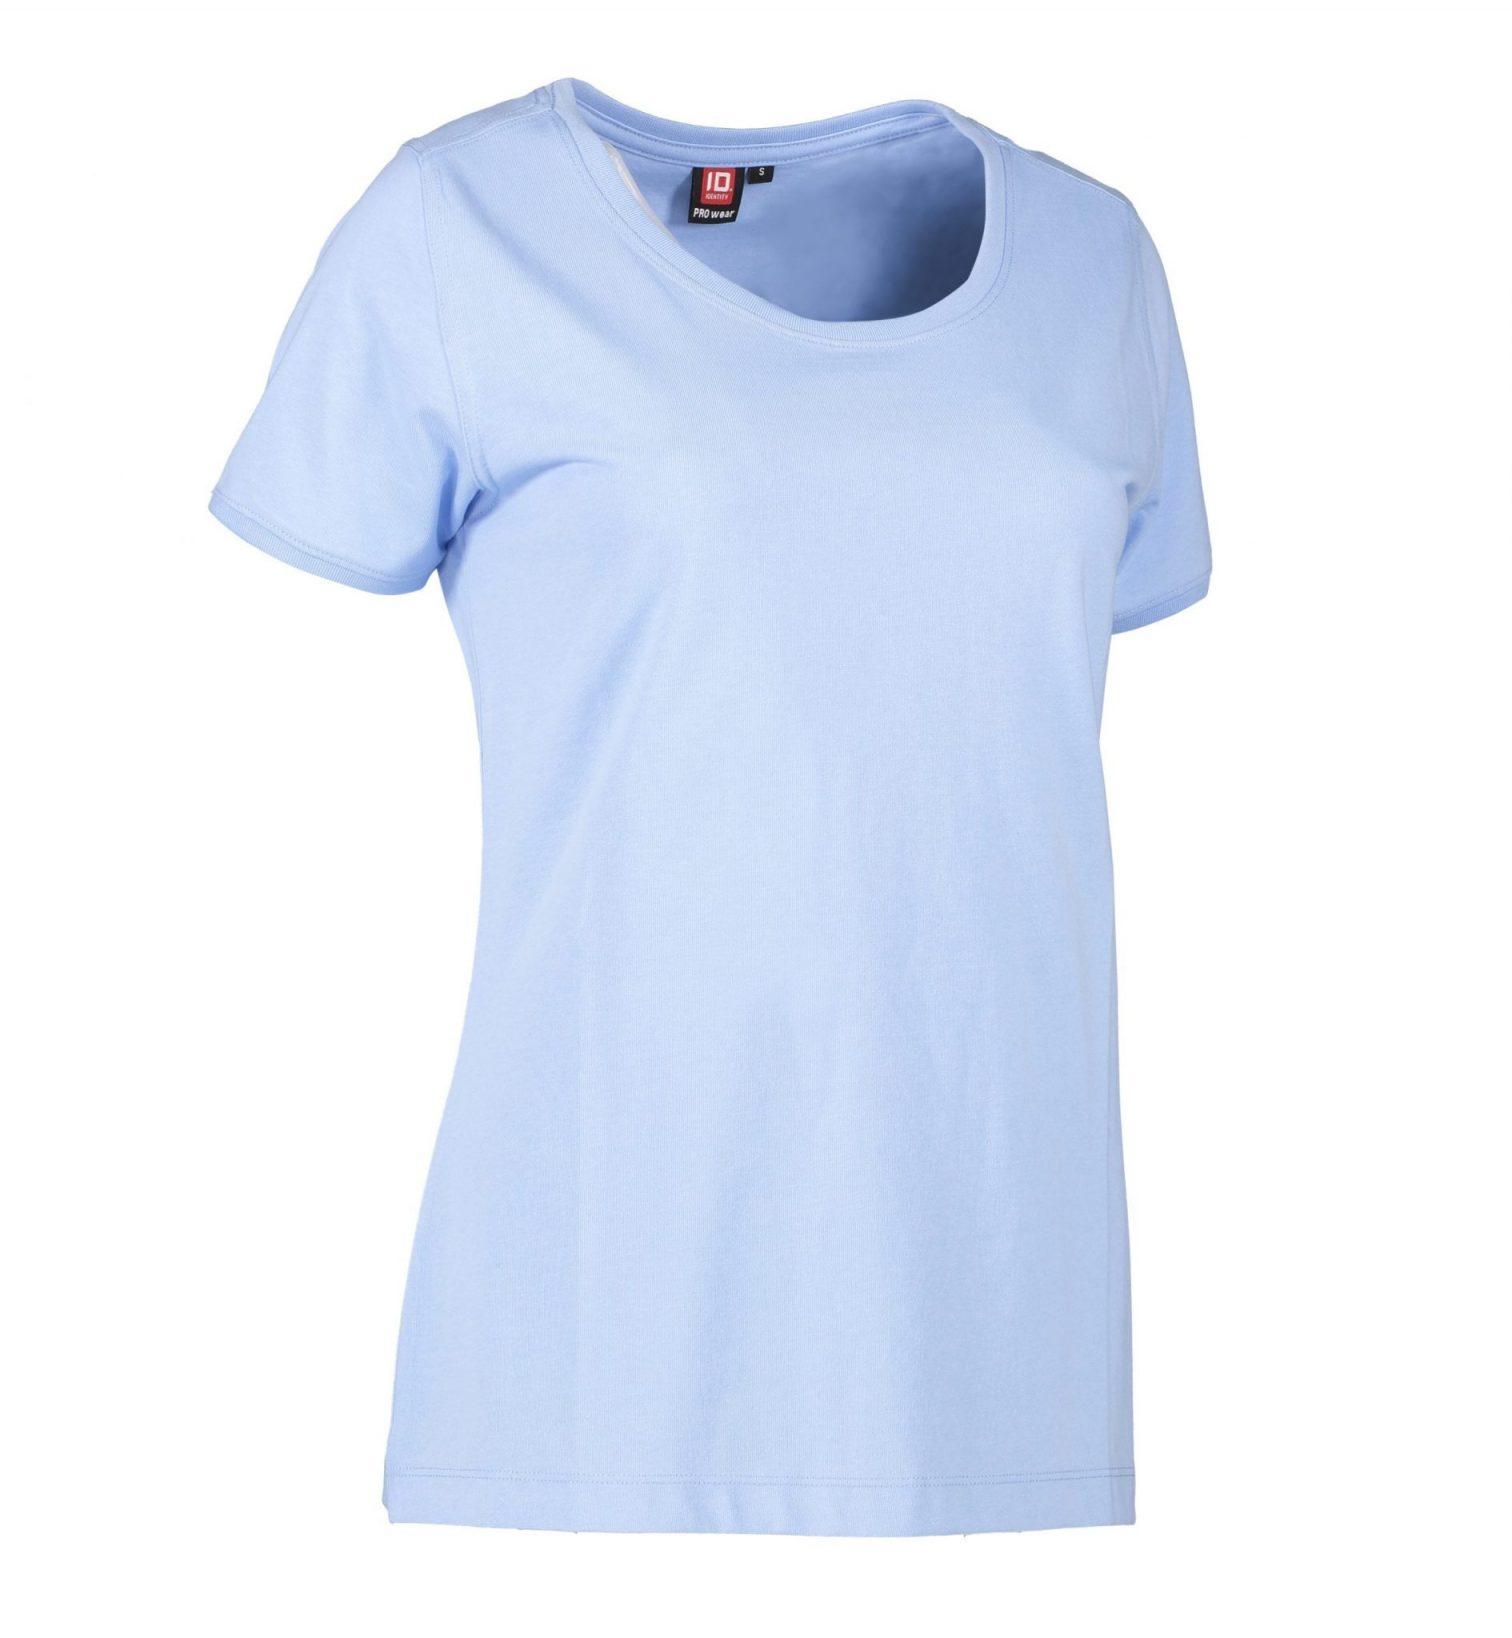 ID PRO Wear CARE T-shirt EU-Blomst certificeret dame lys blå